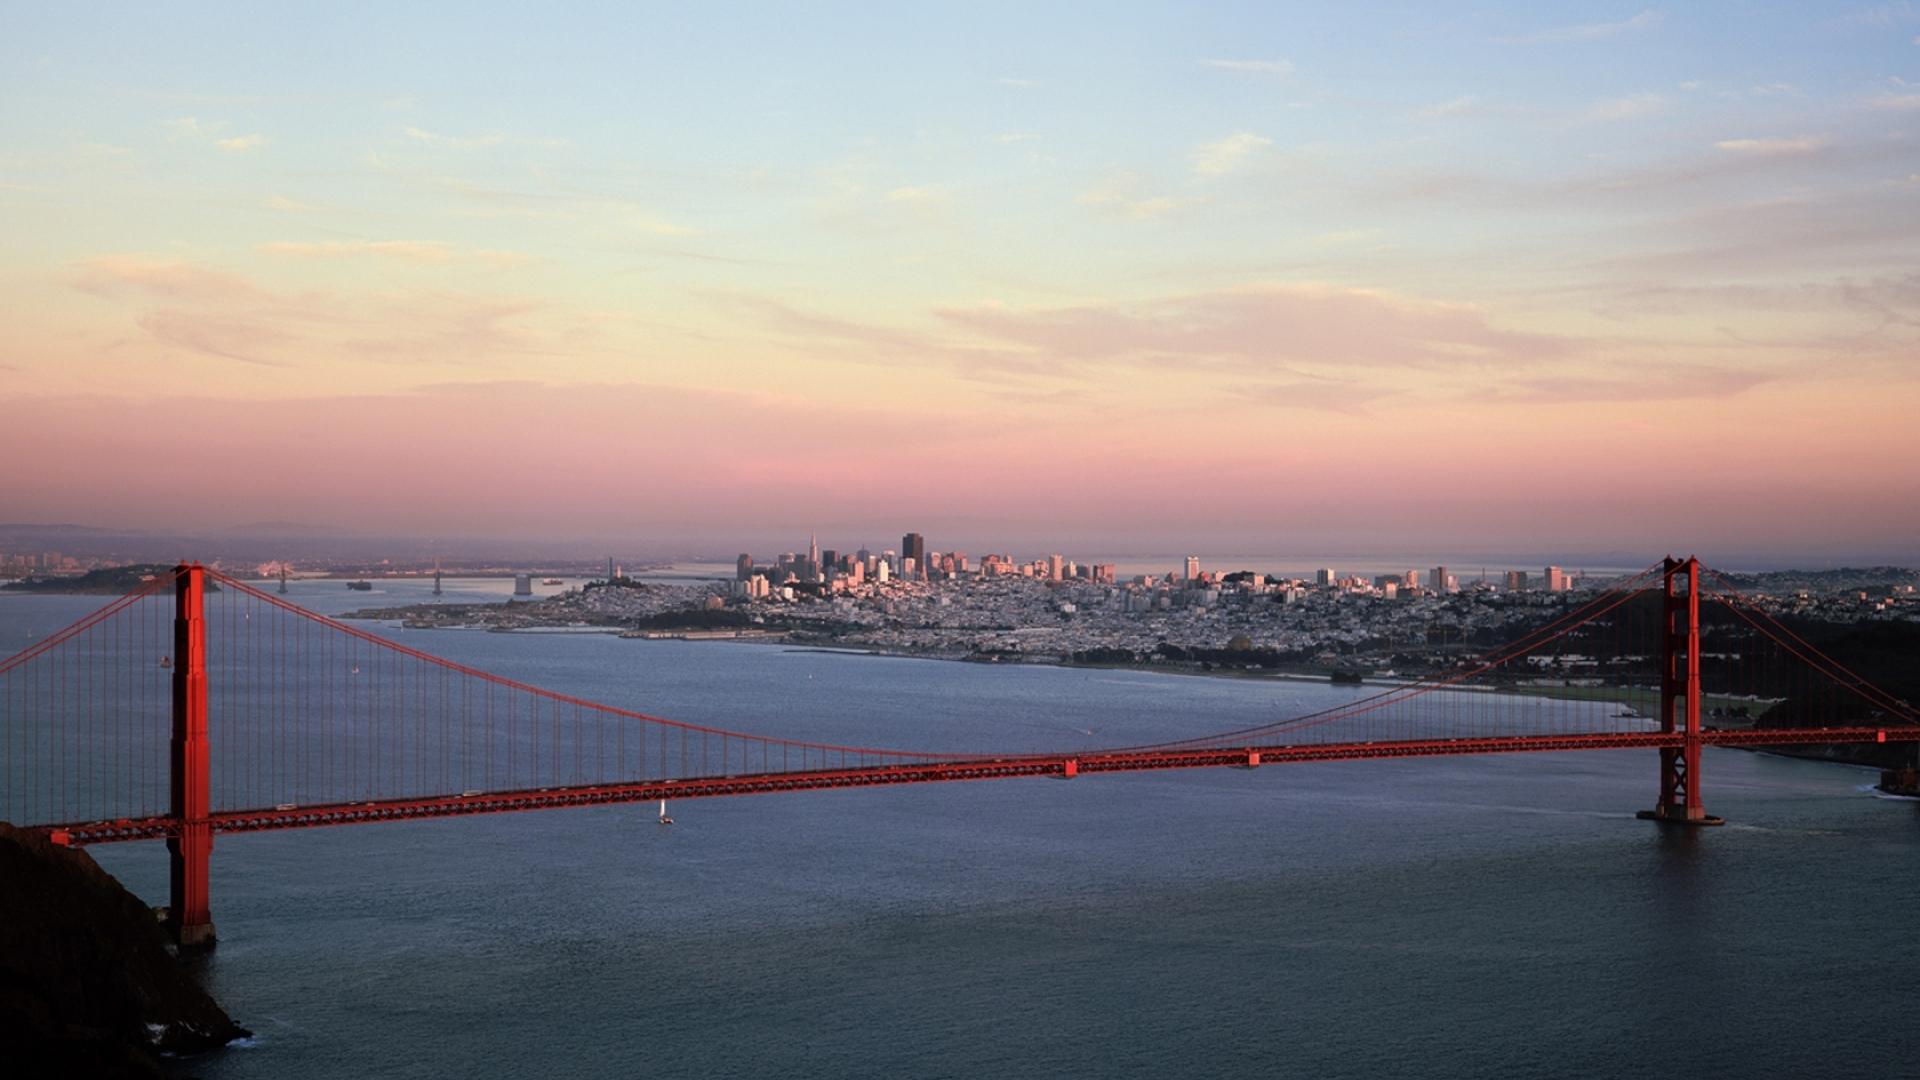 1920x1080 San Francisco Golden Gate Bridge City 1080p Laptop